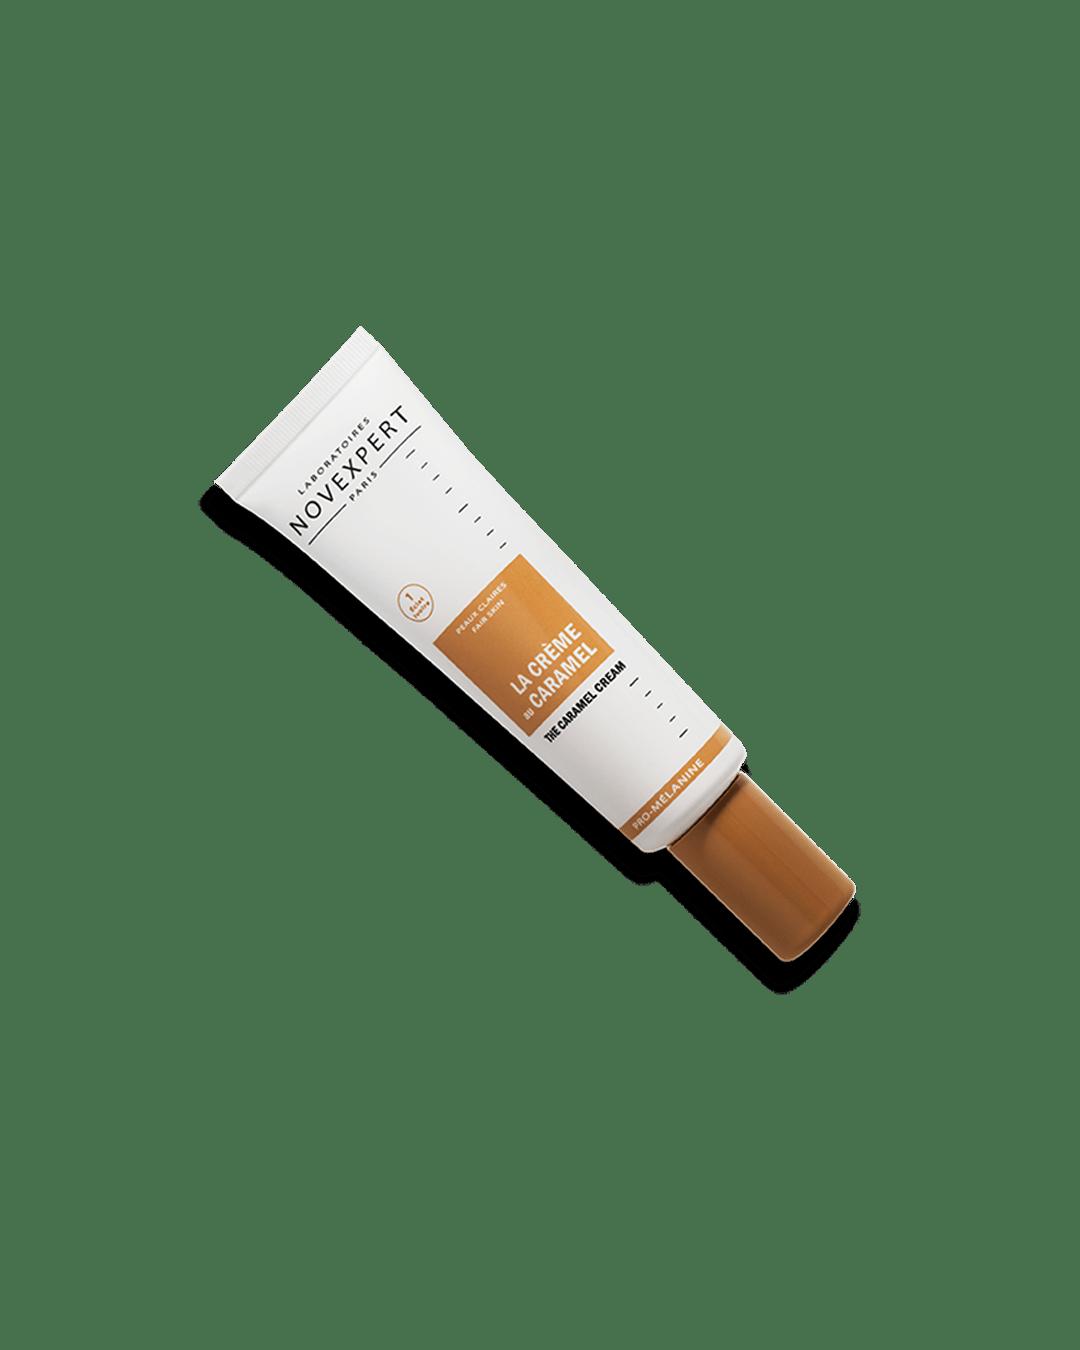 The Caramel Cream Fair Skin Ivory Radiance